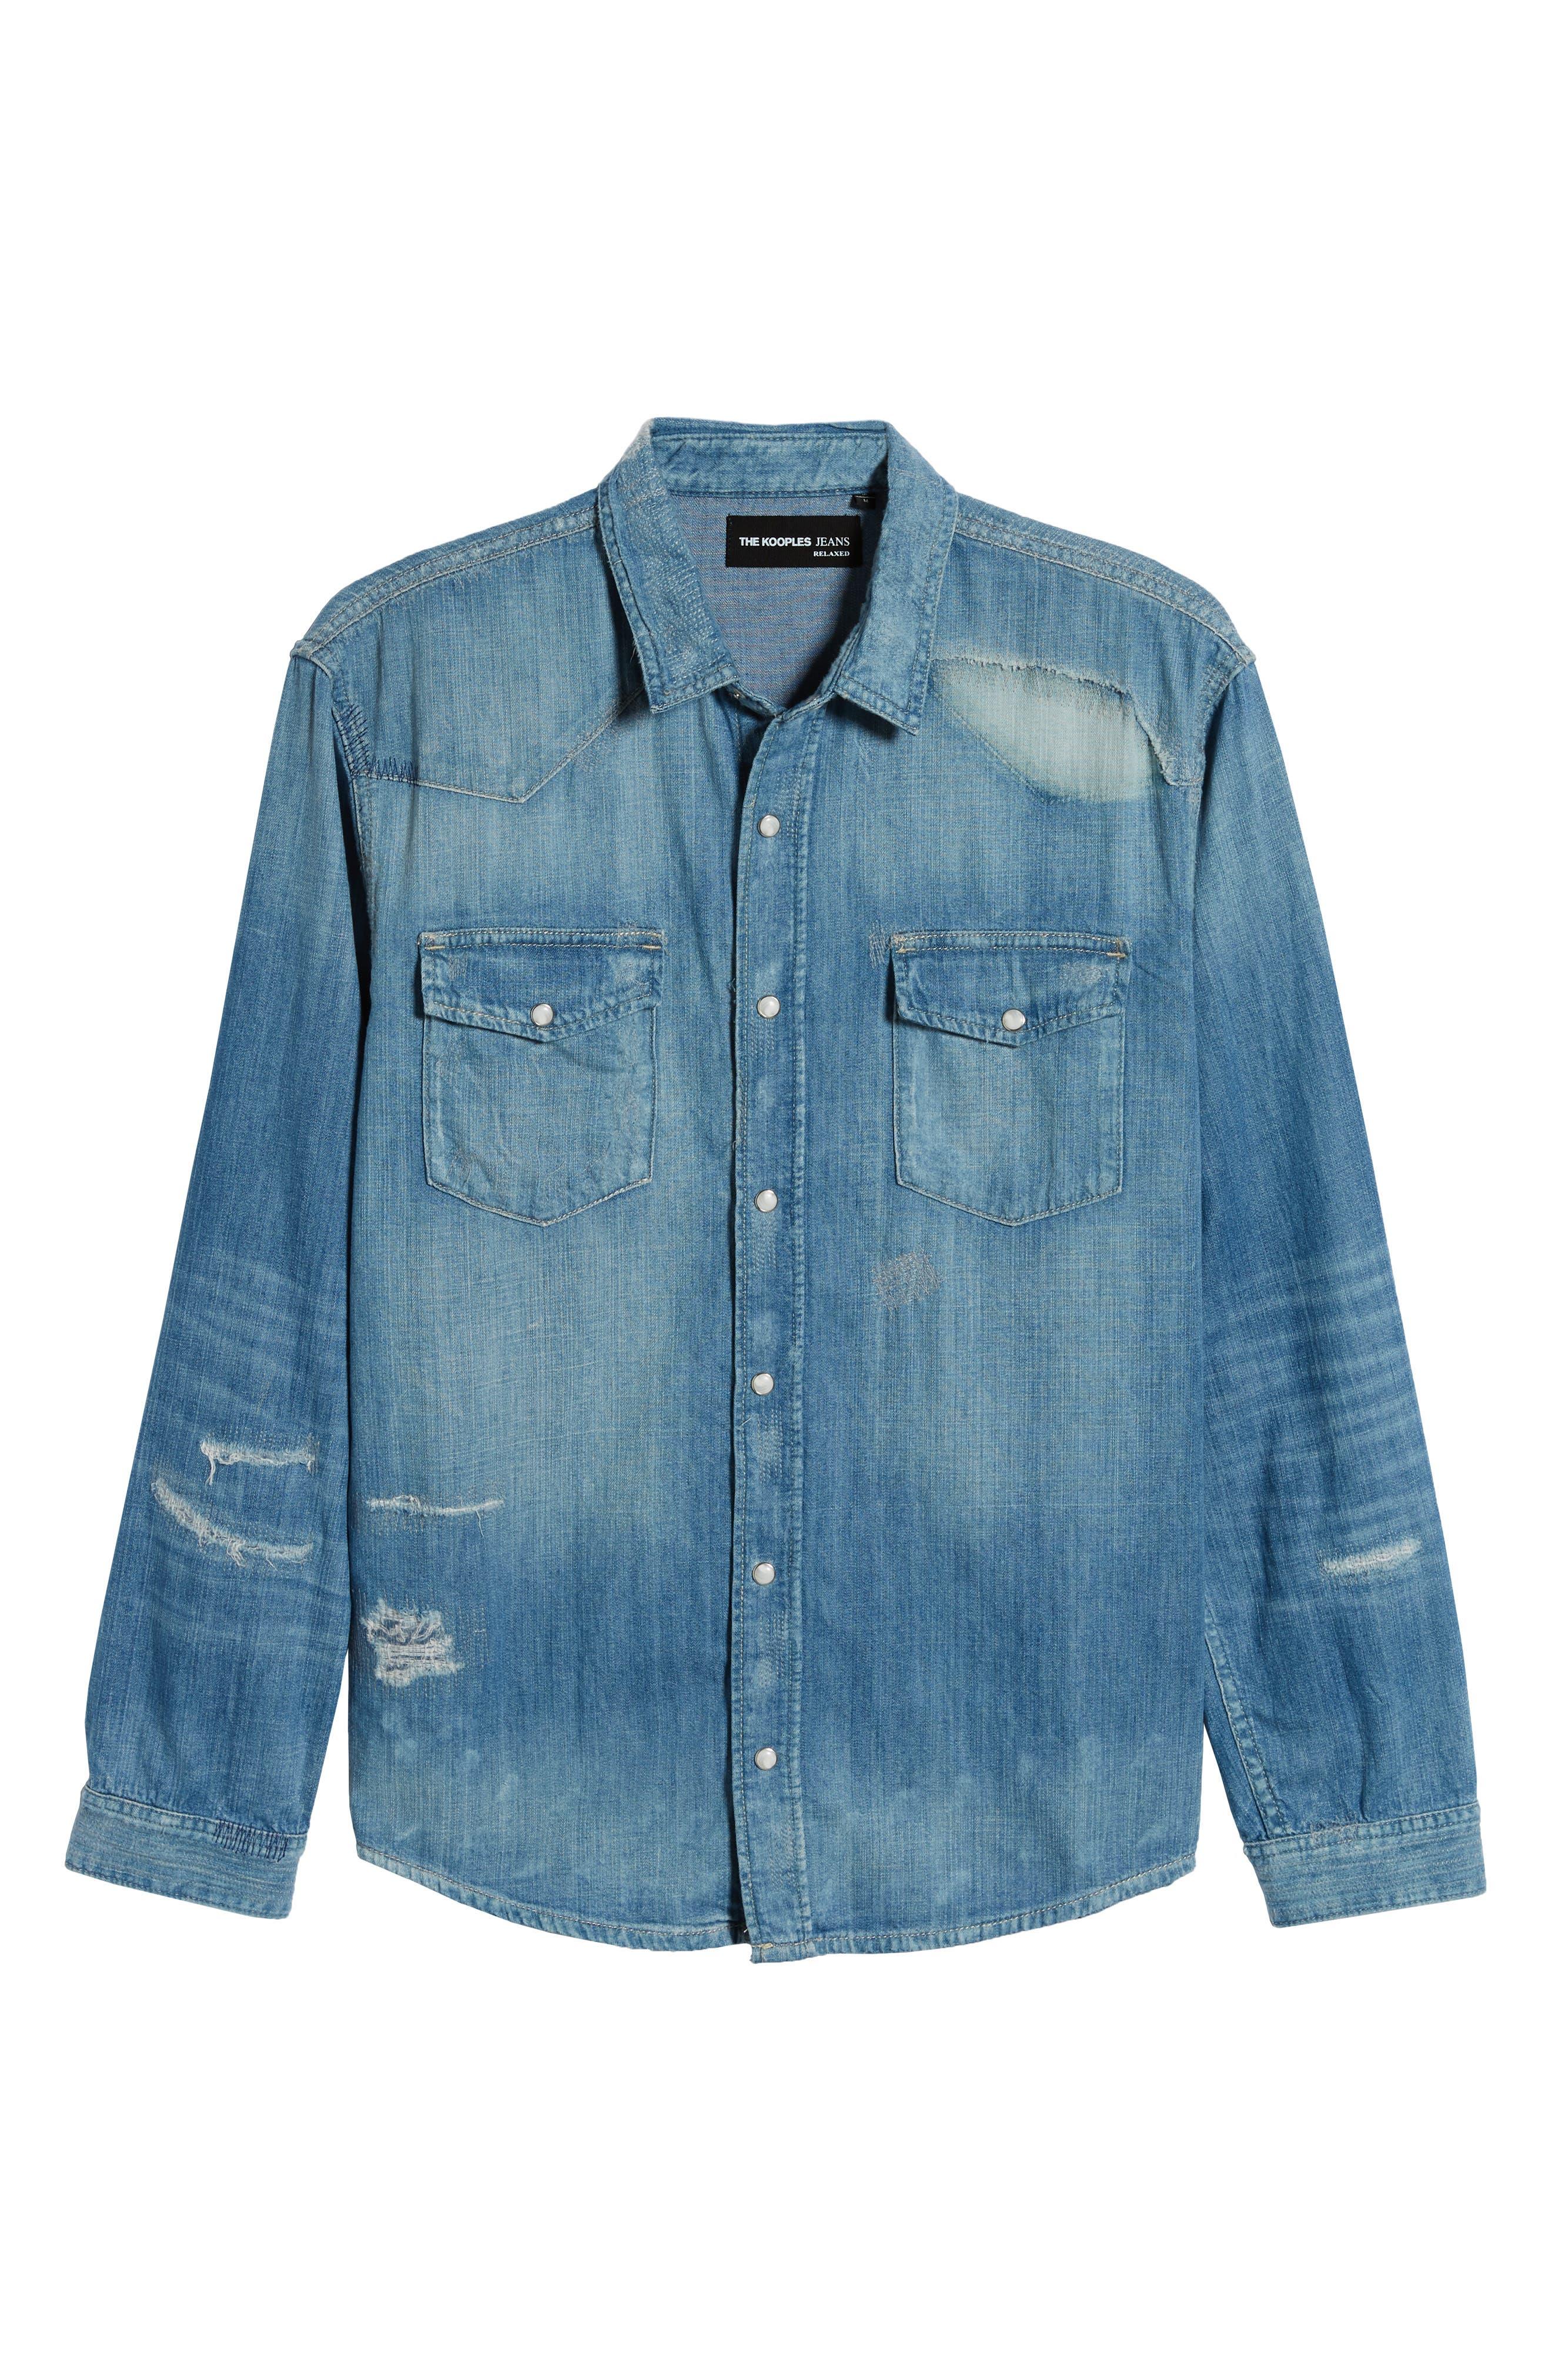 THE KOOPLES, Ripped Denim Shirt, Alternate thumbnail 5, color, BLUE DENIM